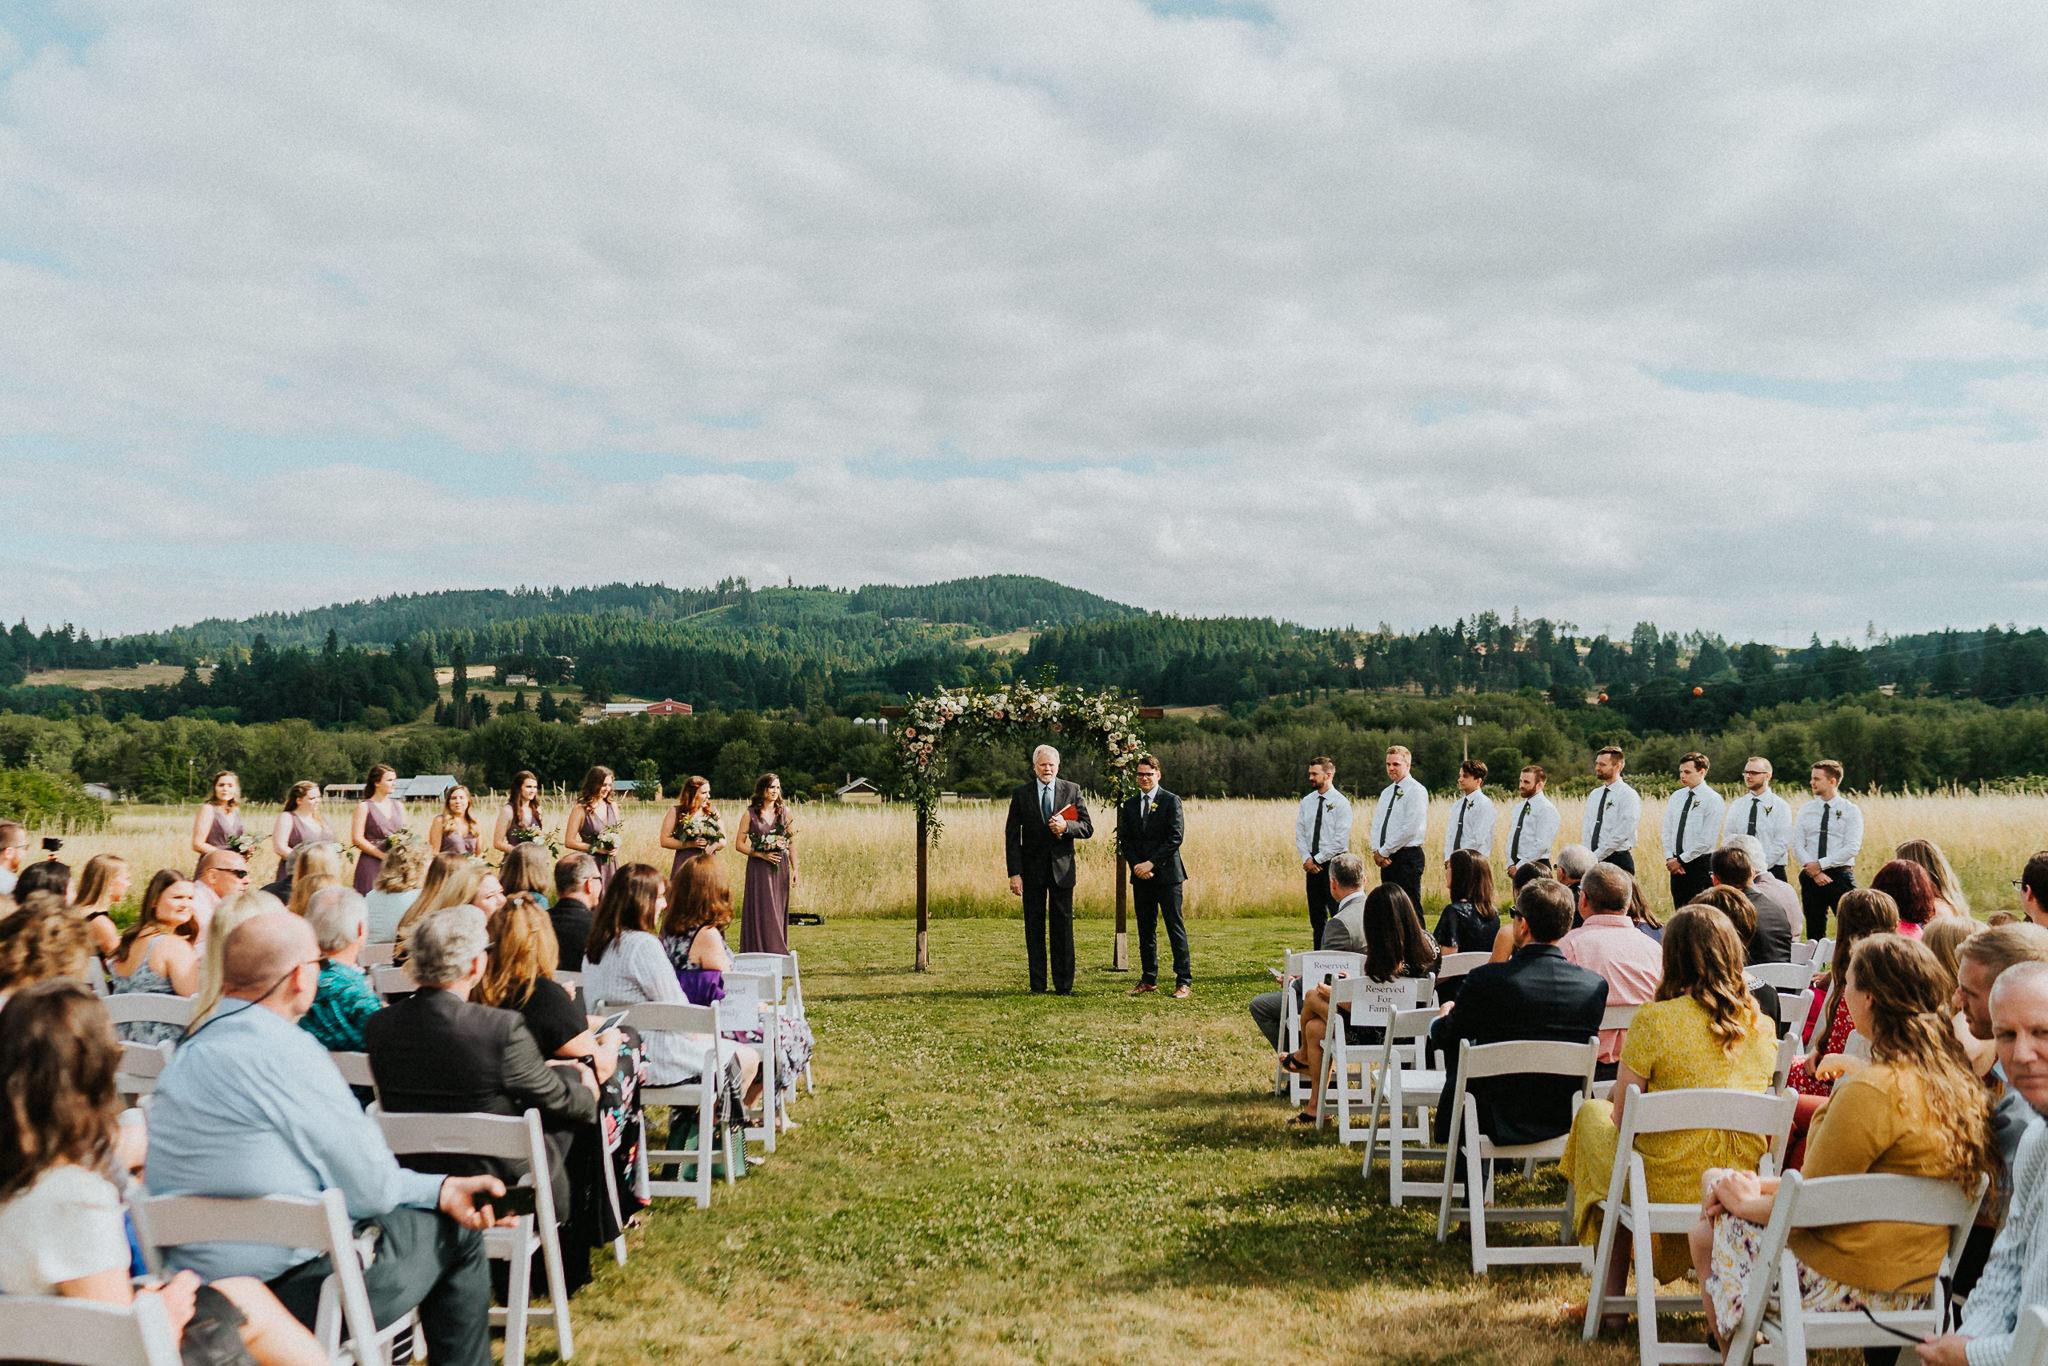 Groom waiting groomsmen bridesmaid alter Water Oasis Alfred Tang Photography